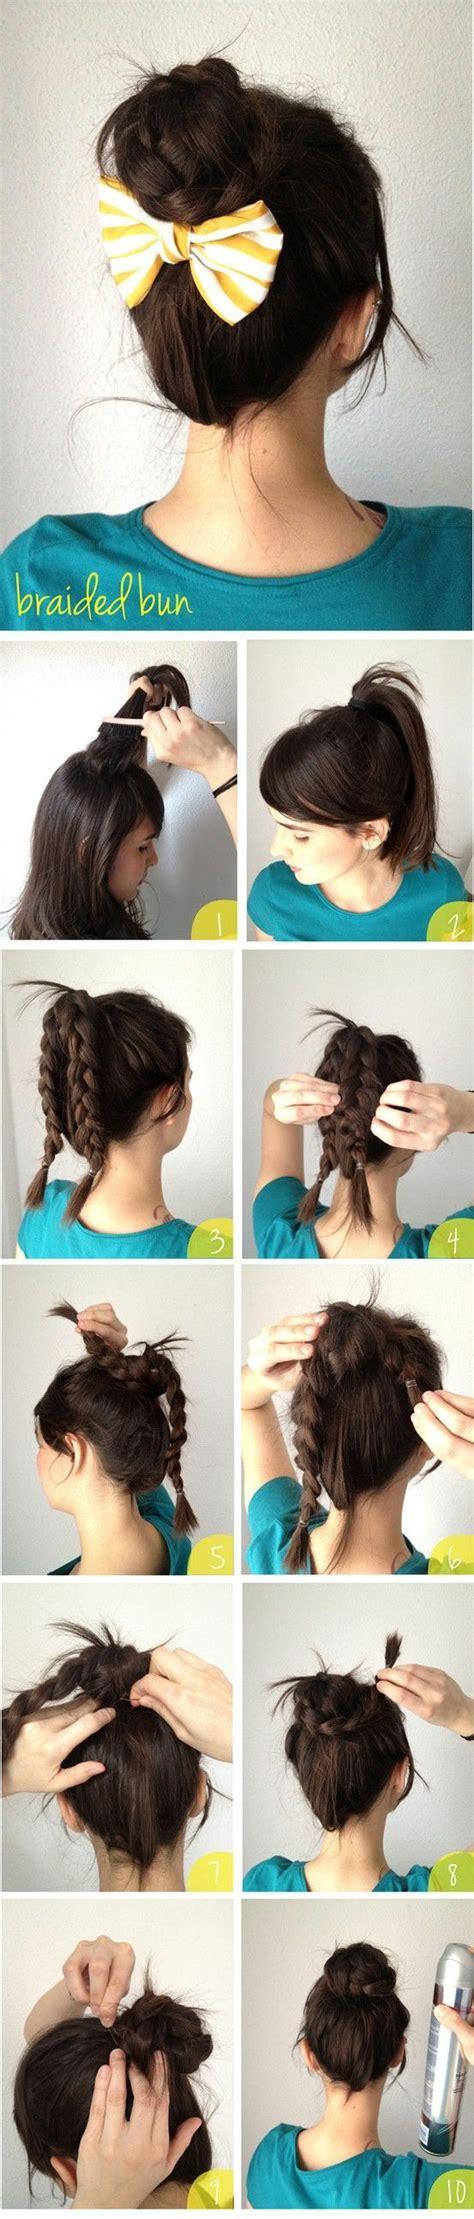 how to do nice hairstyles step by step braid bun hair tutorial diy hairstyle haircuts